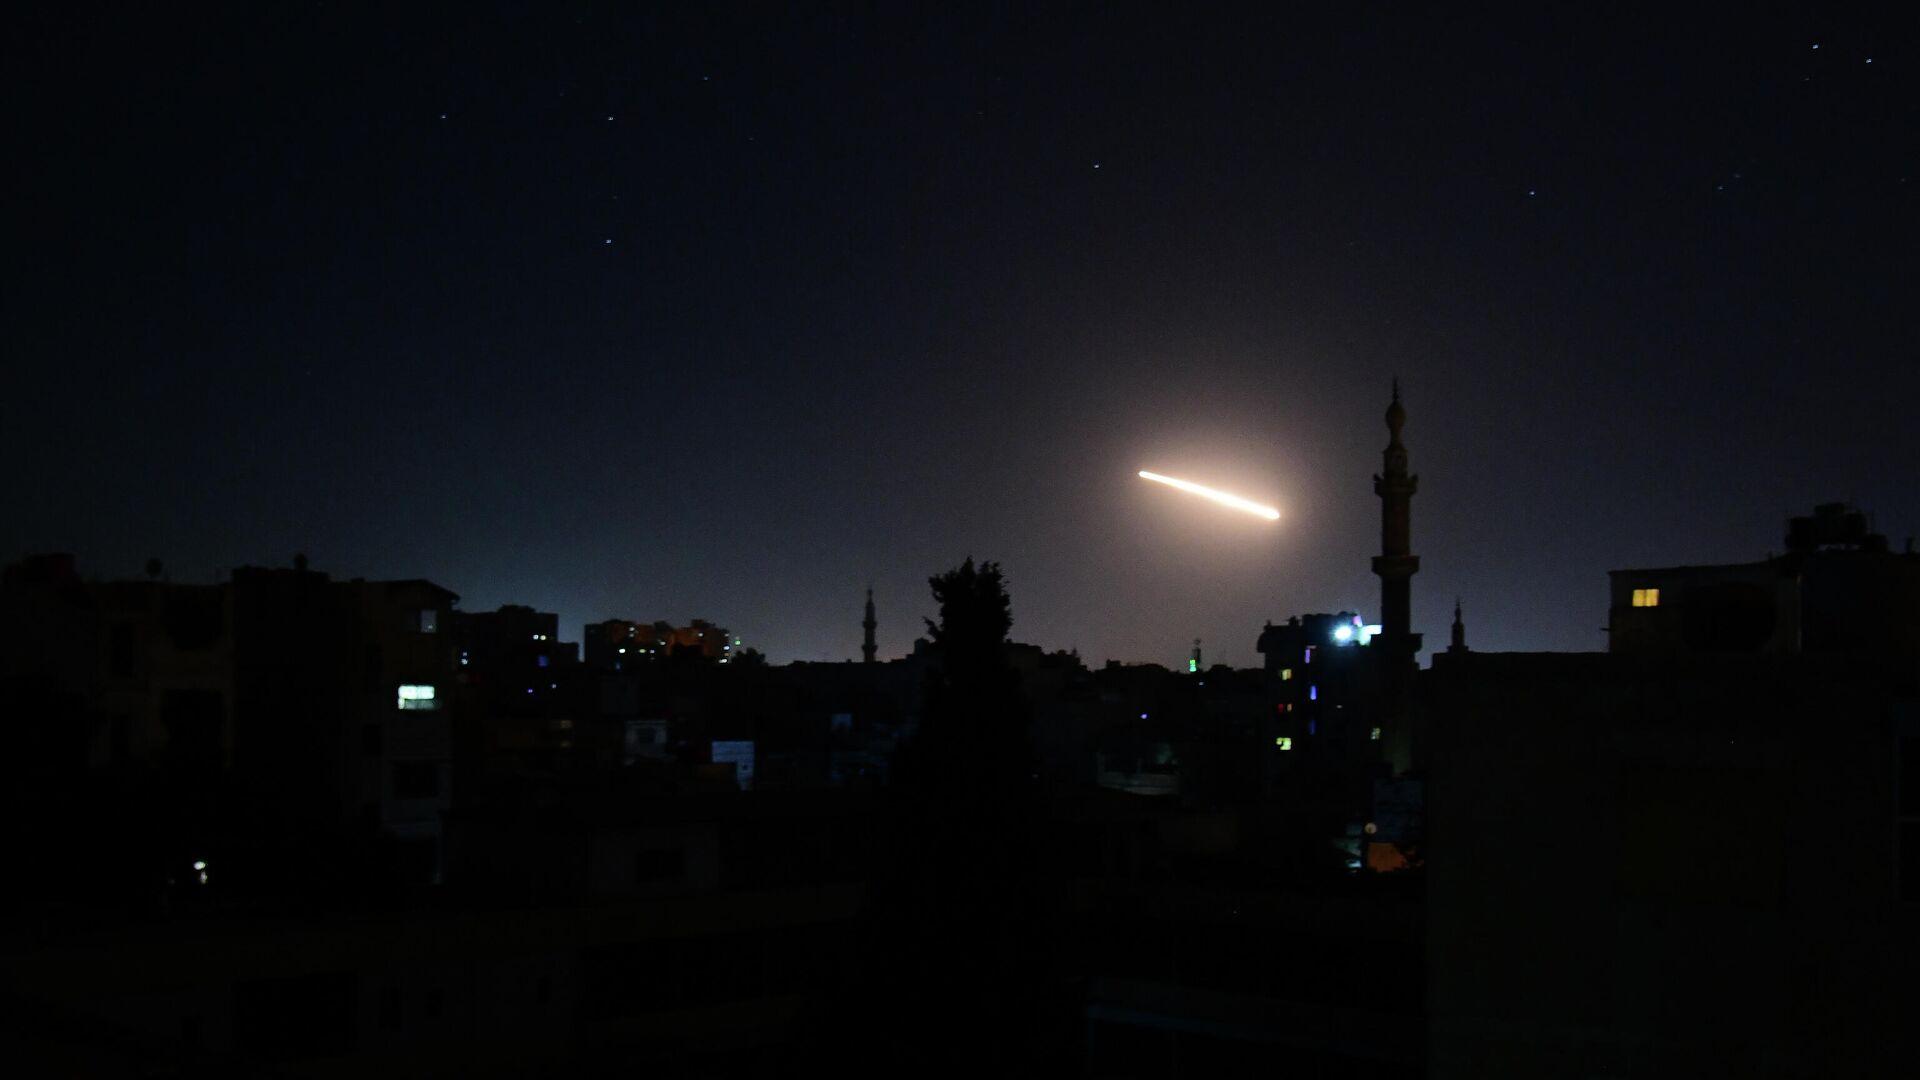 Sistemas antiaéreos sirios repeliendo un ataque sobre Damasco - Sputnik Mundo, 1920, 08.06.2021